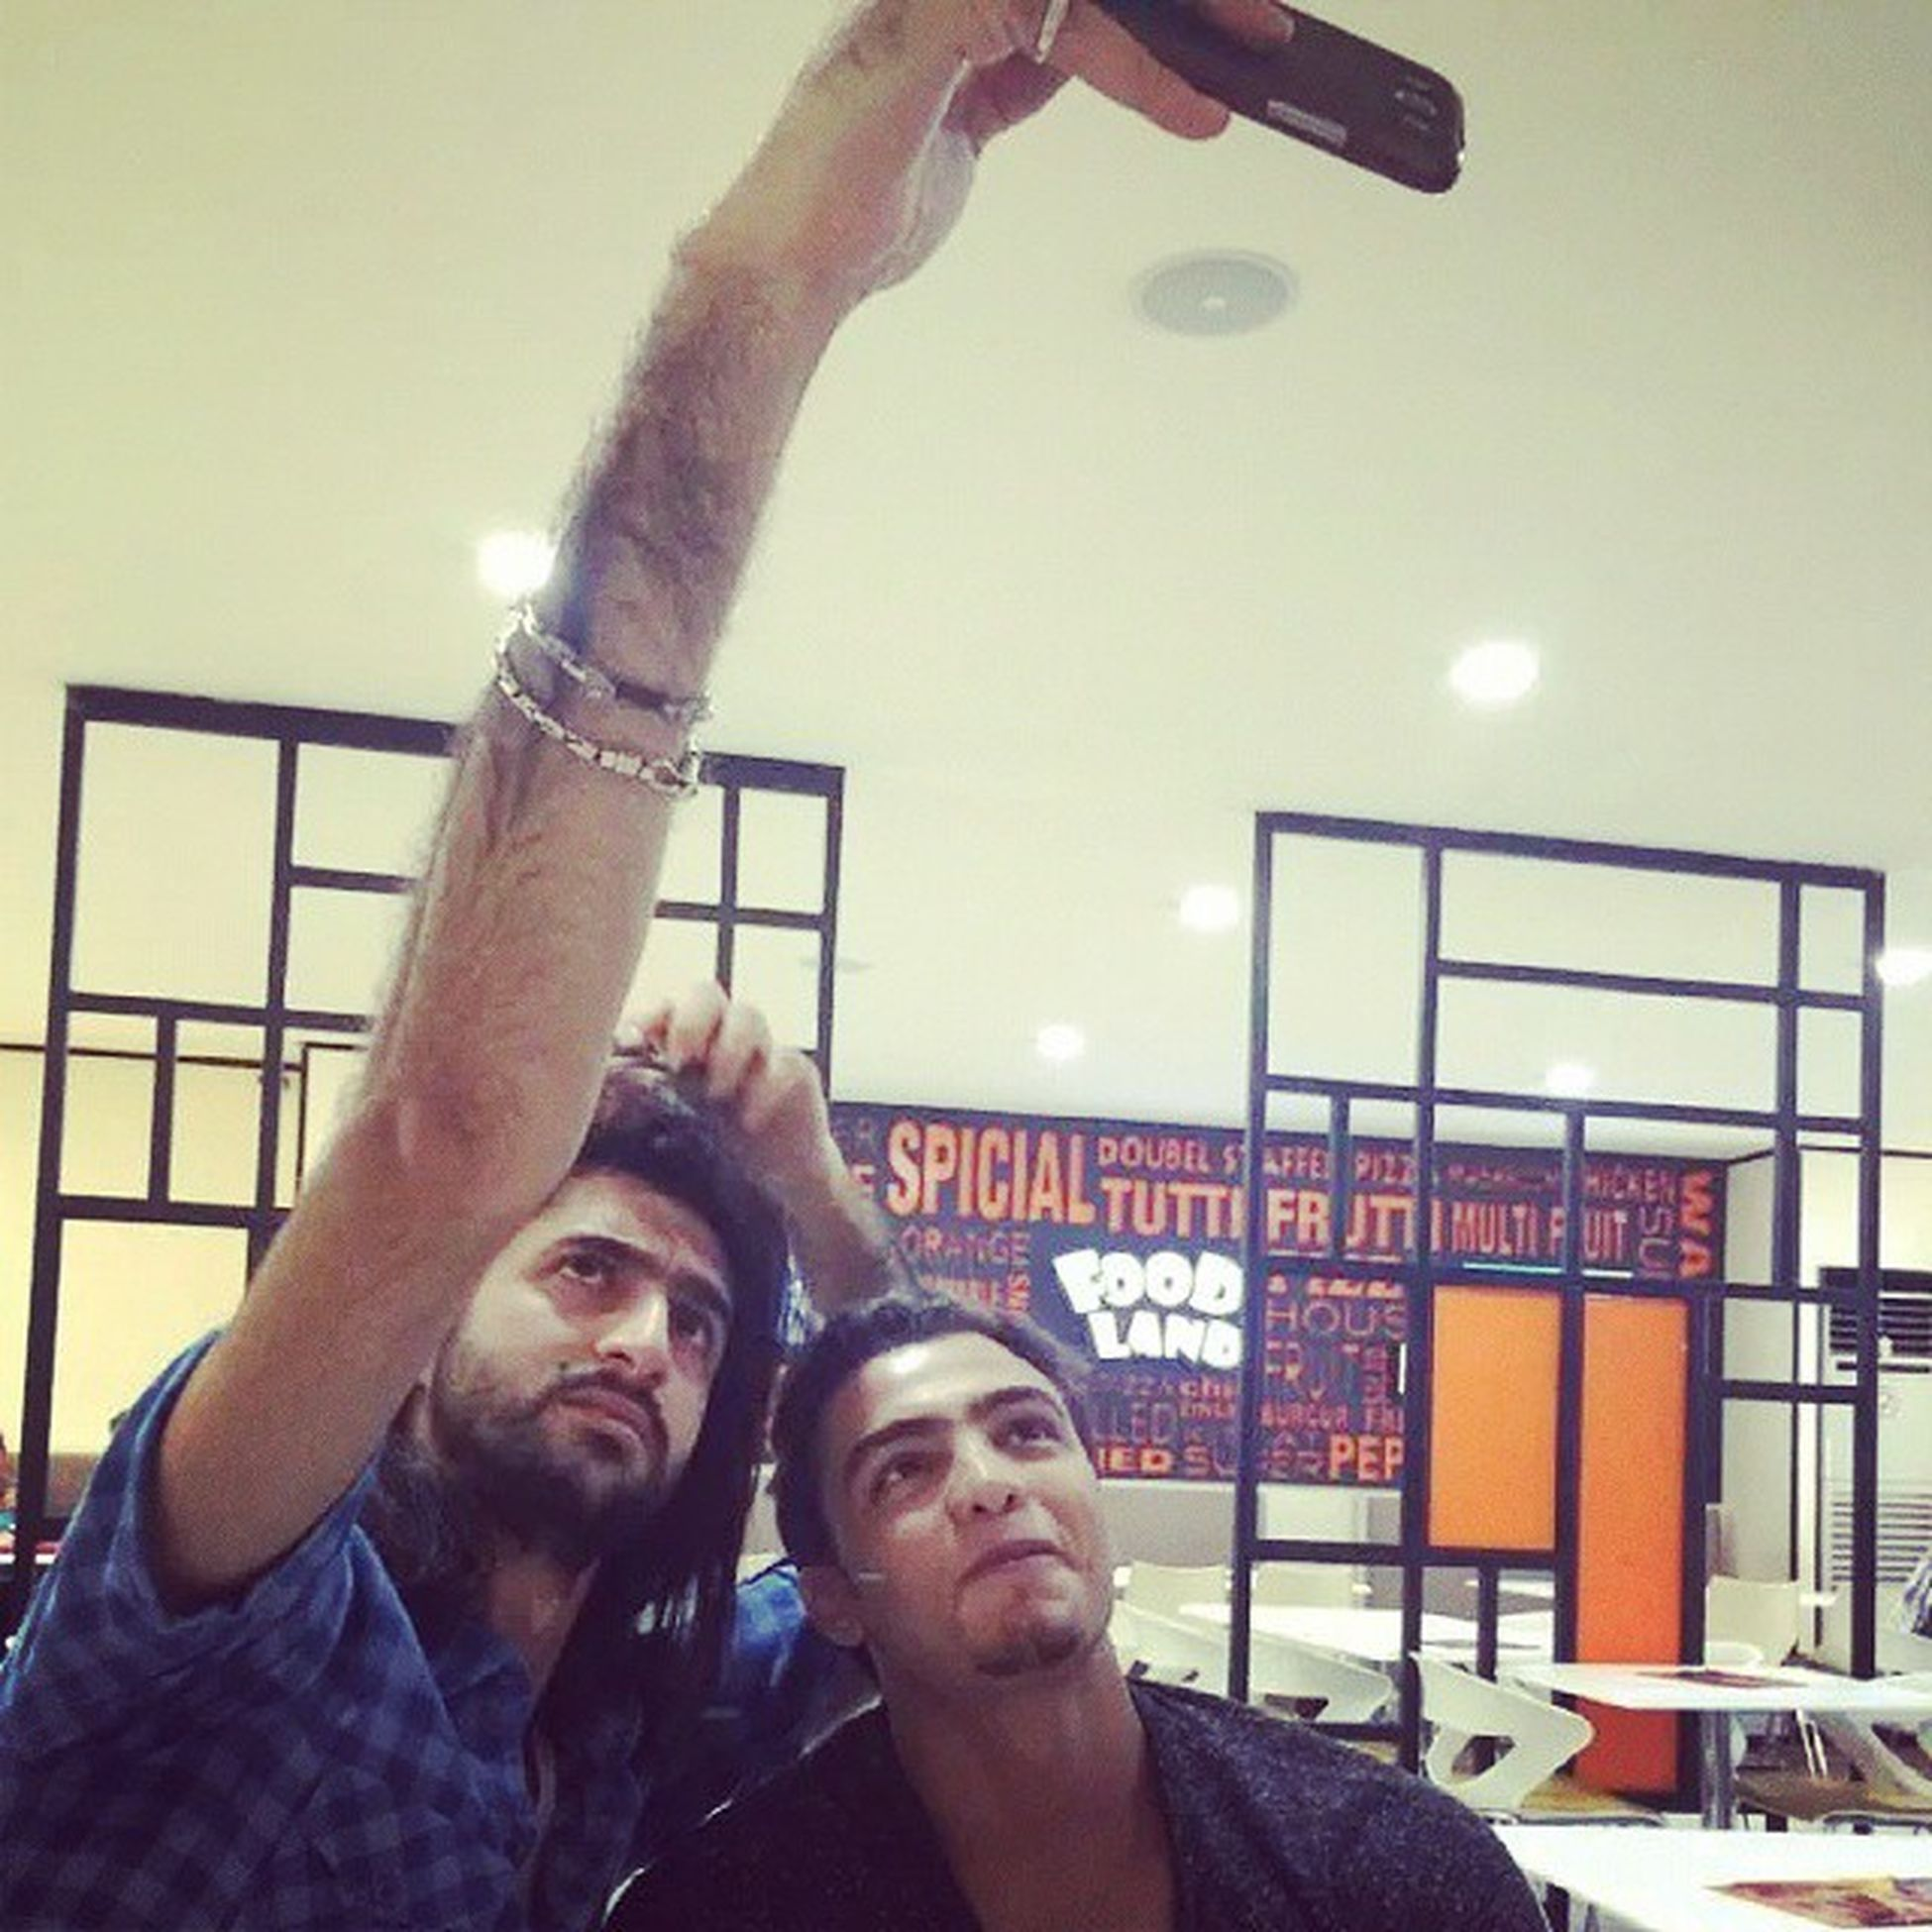 ^~^ Happytime Happy Handsome Photo Photographer guys selfie .... ^~^